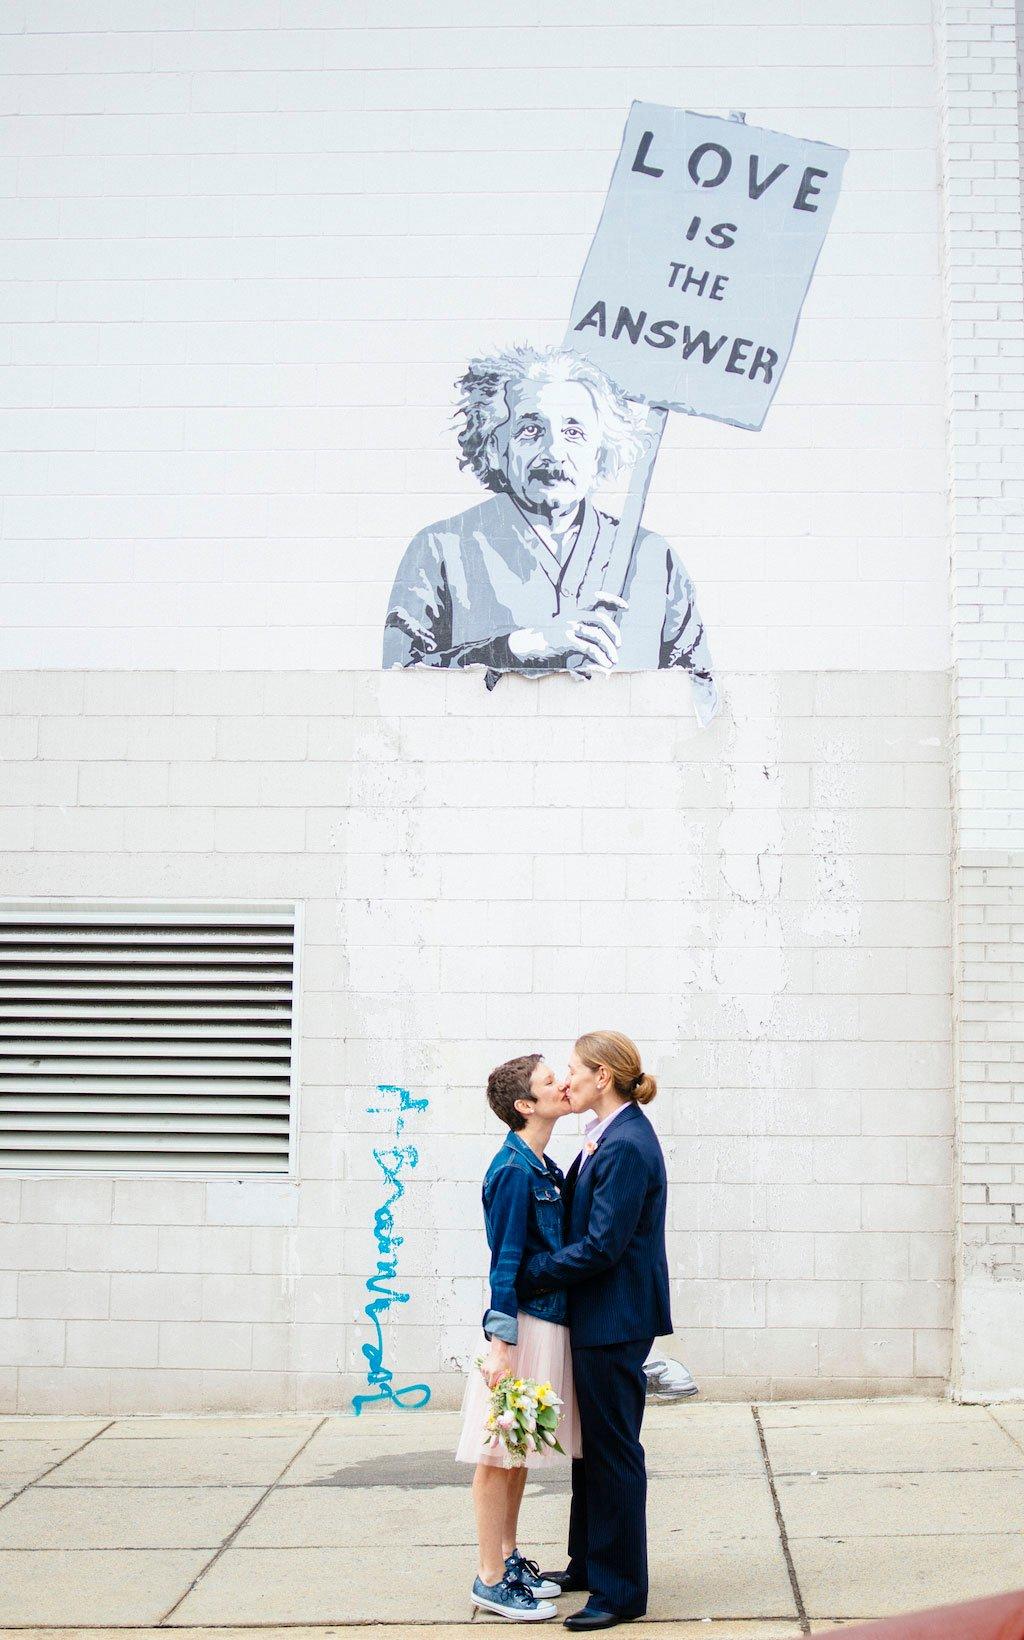 9-9-16-pop-up-wedding-union-market-murals-13